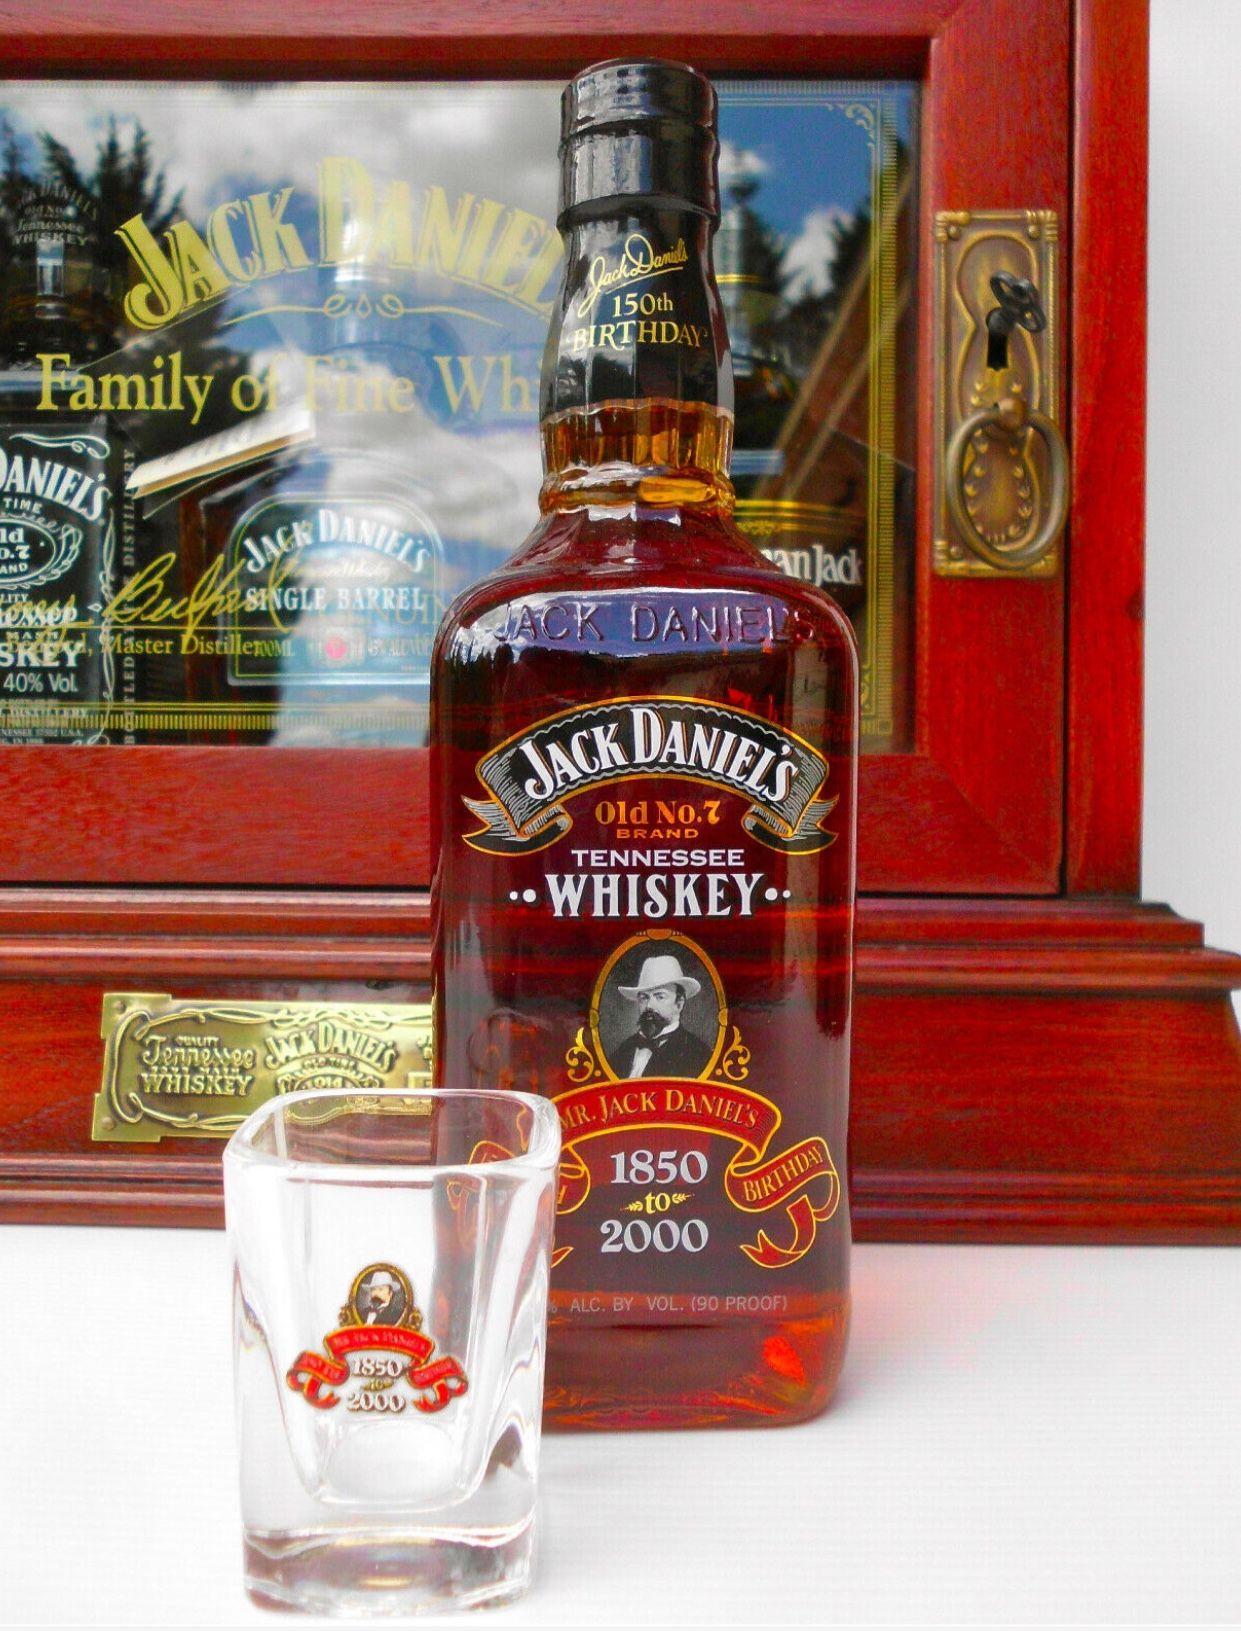 Jack Daniel S 150th Birthday Anniversary Bottle Jack Daniels Bottle Whiskey Jack Daniels Whiskey Bottle